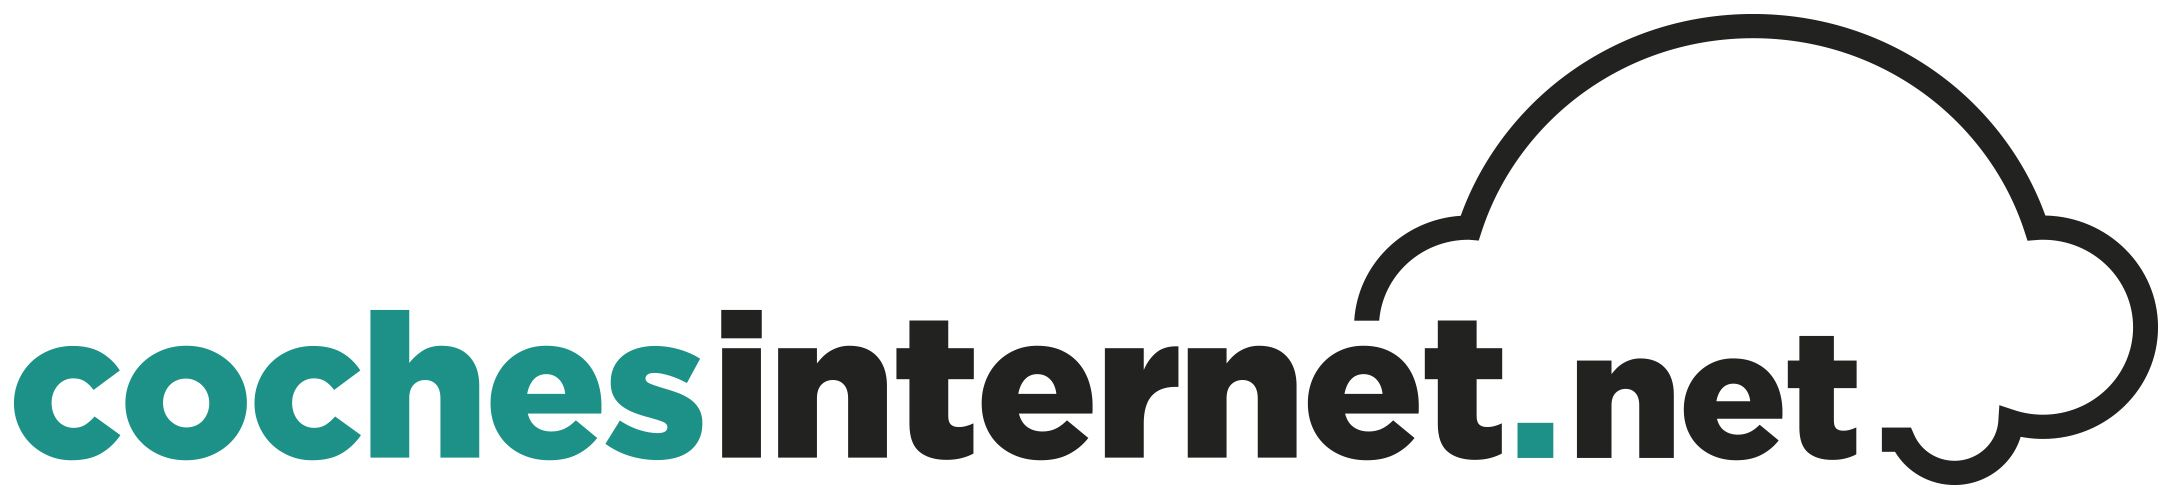 Cochesinternet